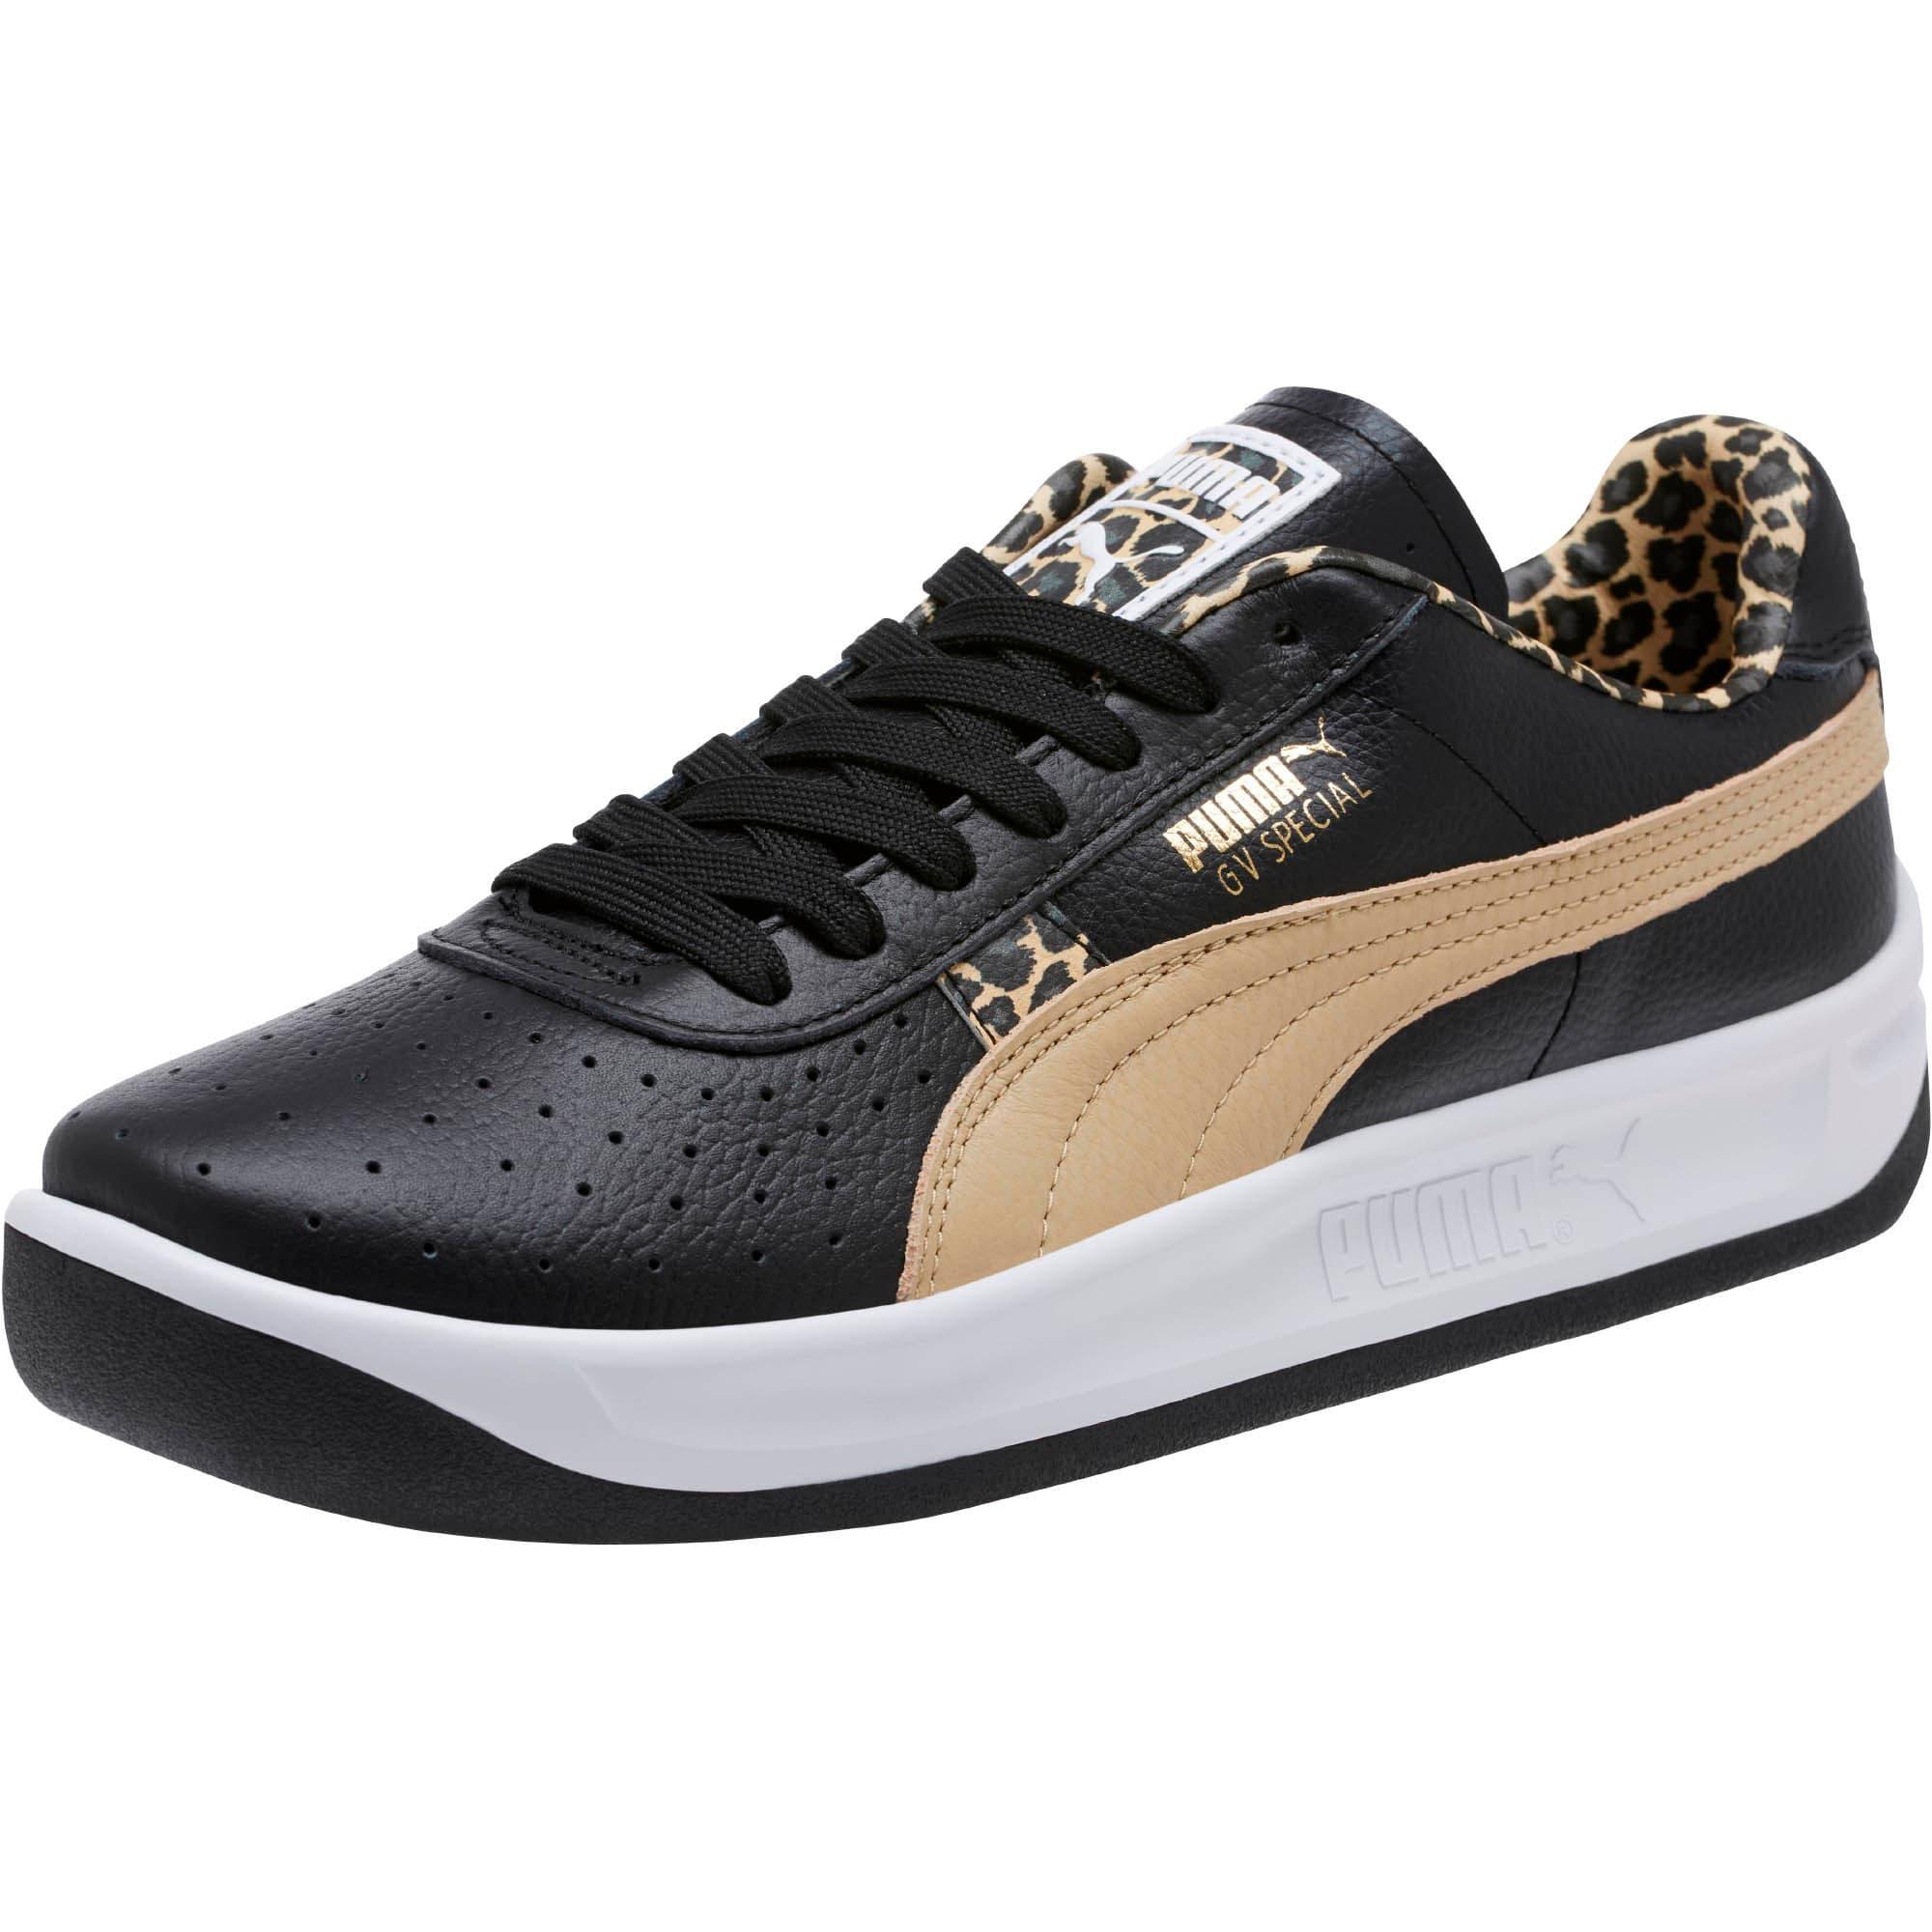 Thumbnail 1 of GV Special Wild Sneakers, Black-Pebble-Puma Team Gold, medium